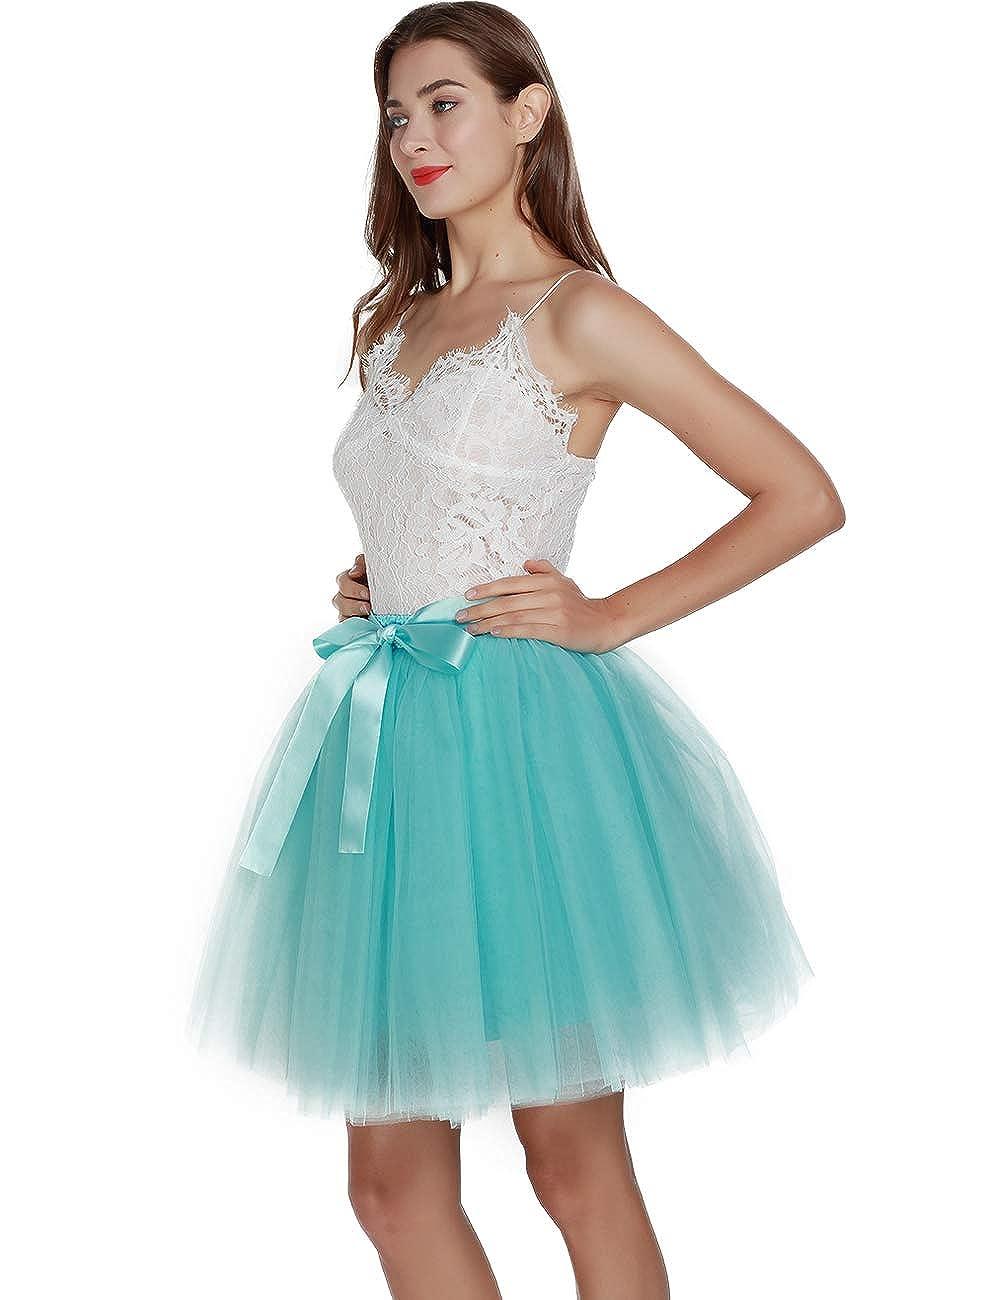 Womens High Waist Princess Tulle Skirt Adult Dance Petticoat A-line Wedding Party Tutu